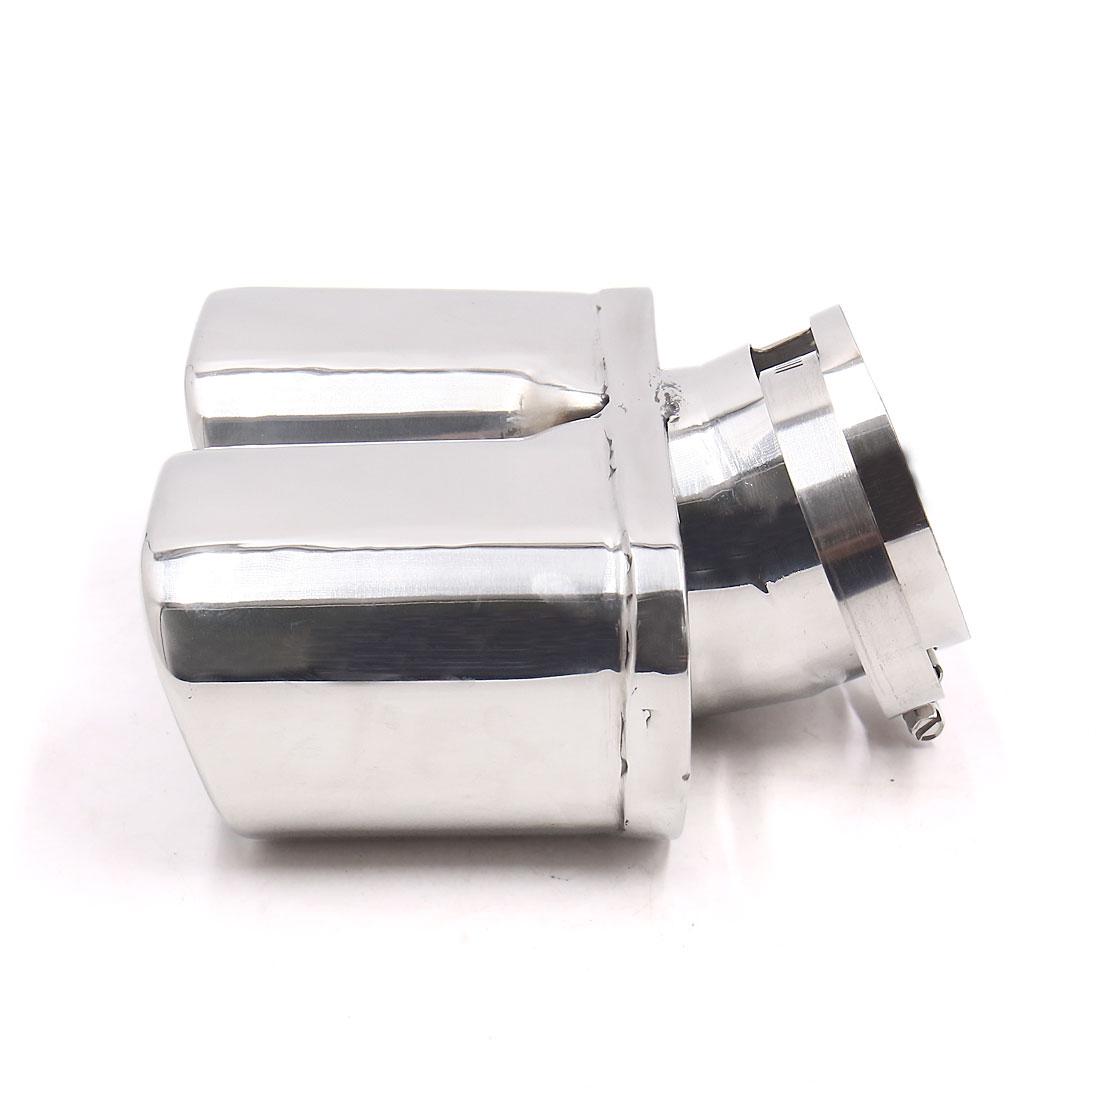 71mm Inlet Inner Diameter Silver Tone Stainless Steel Car Exhaust Pipe Muffler - image 2 de 4